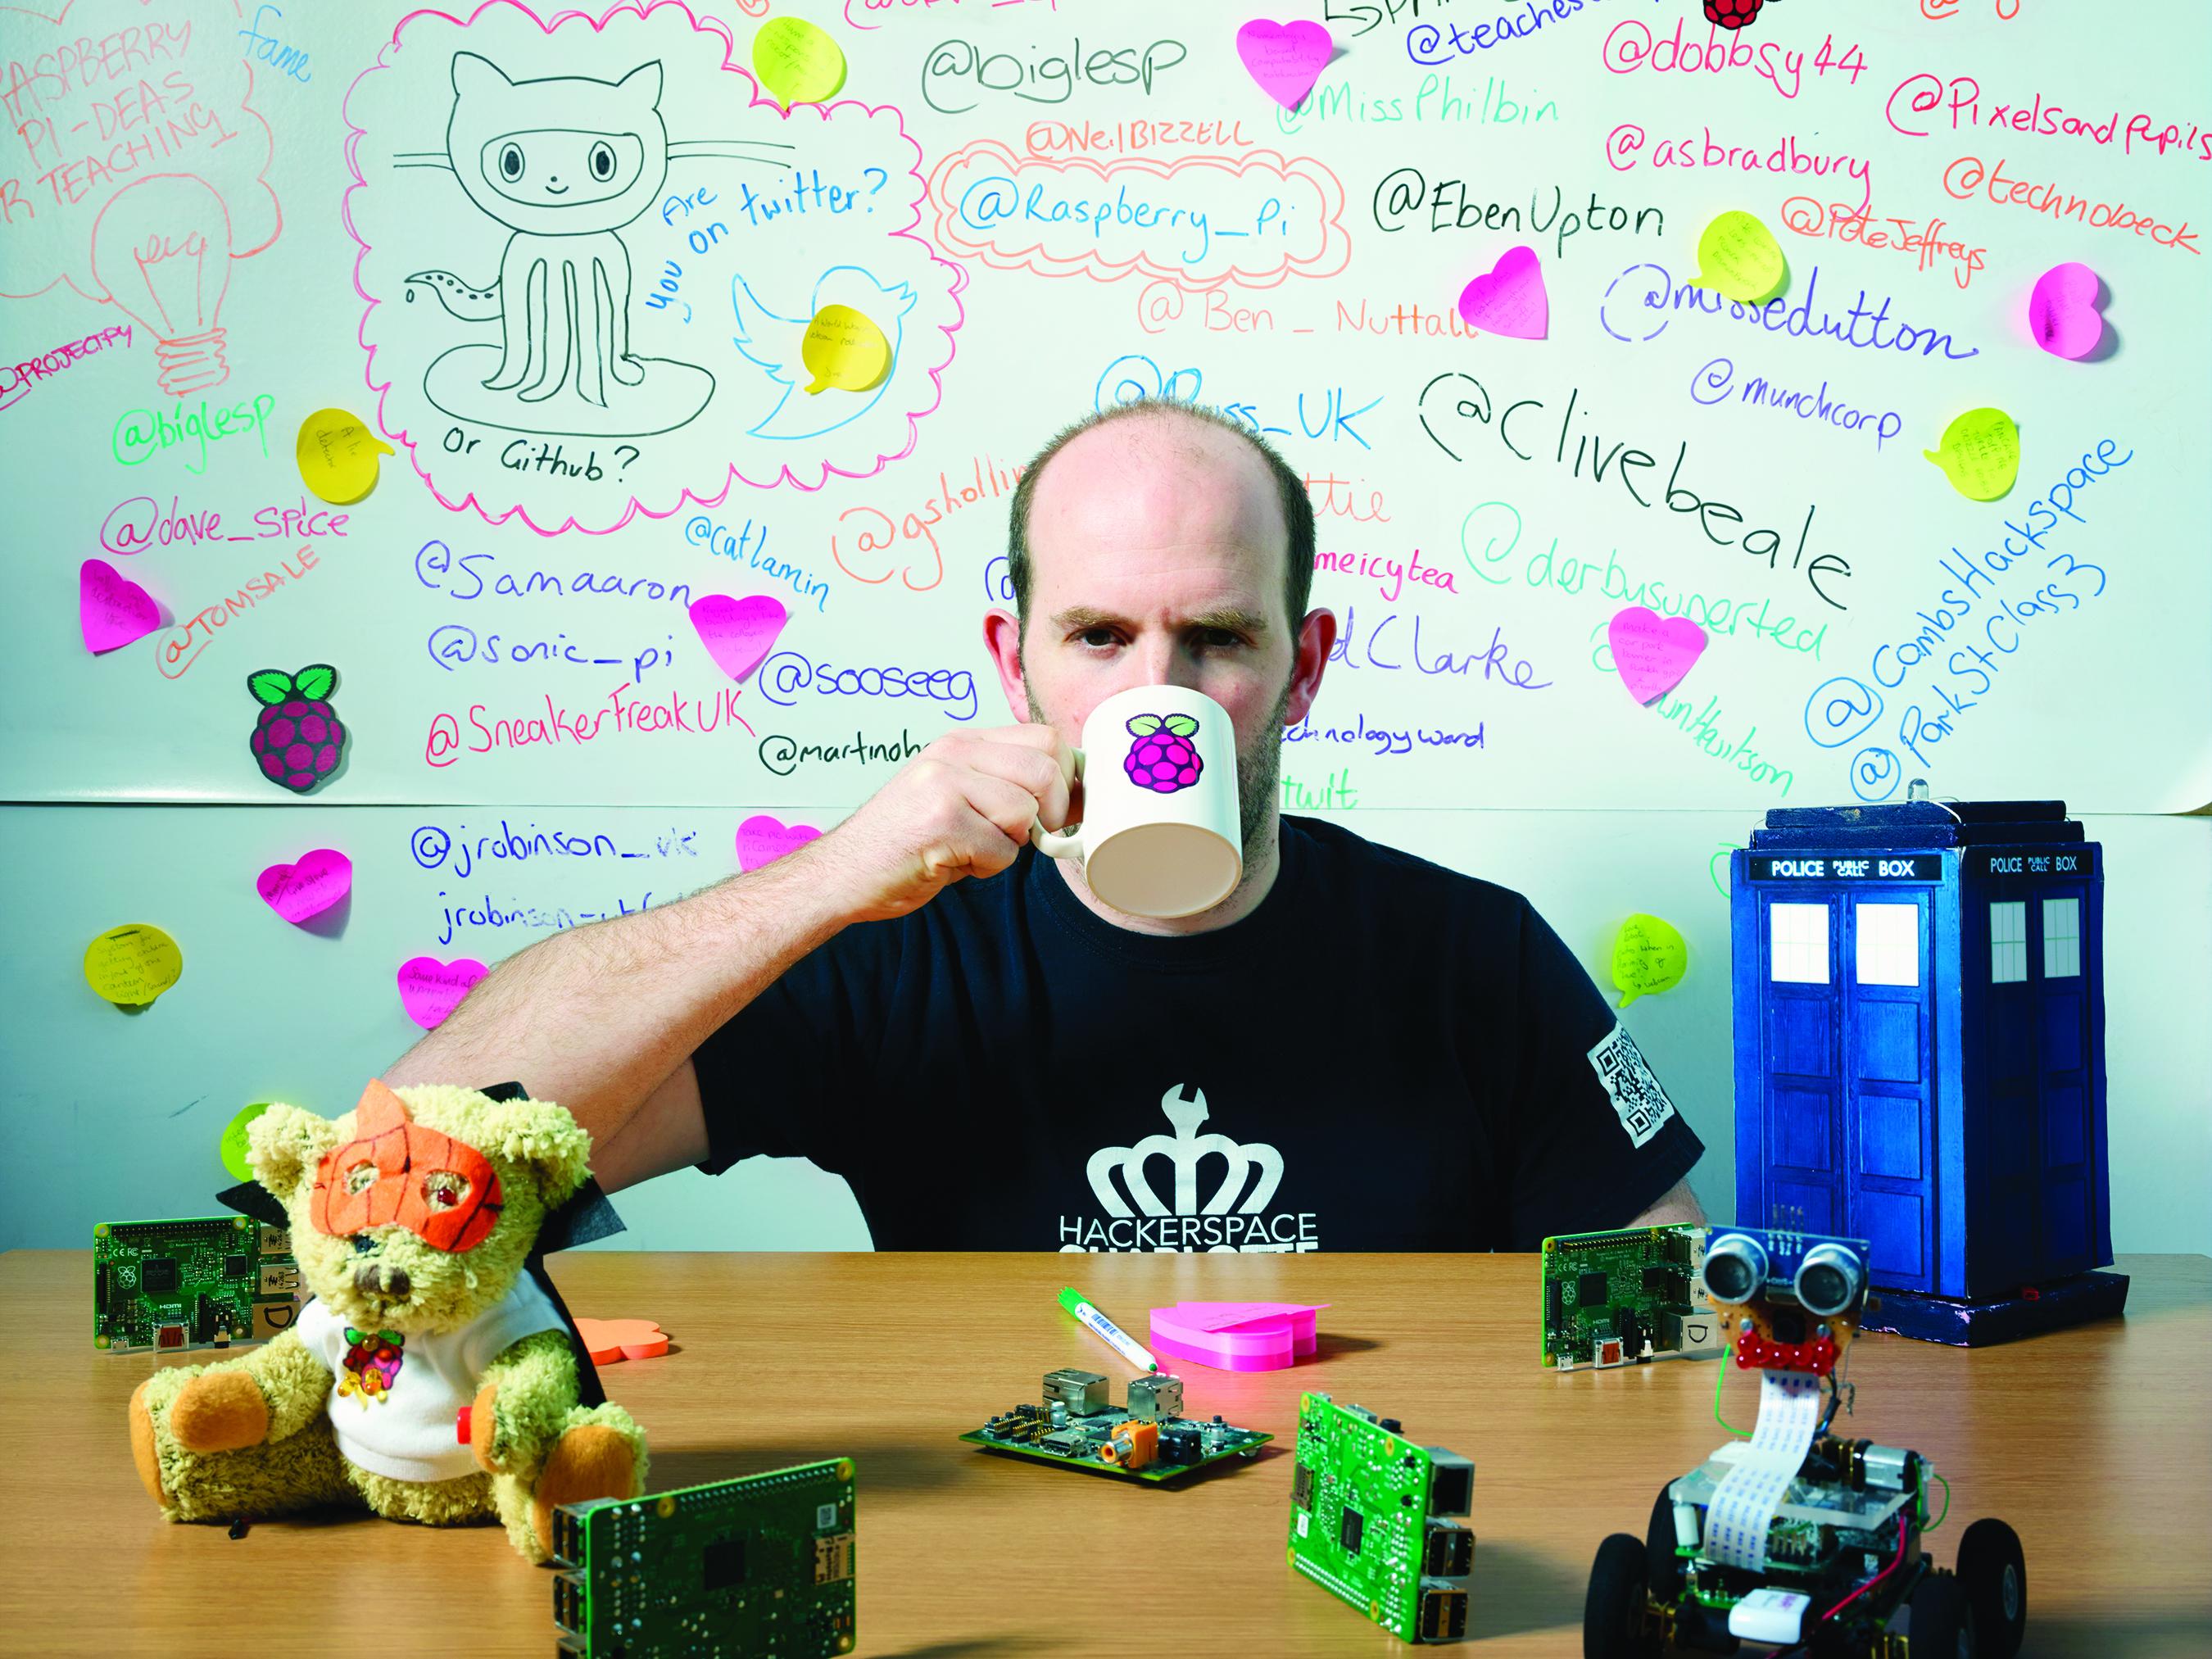 How The Raspberry Pi Sparked A Maker Revolution